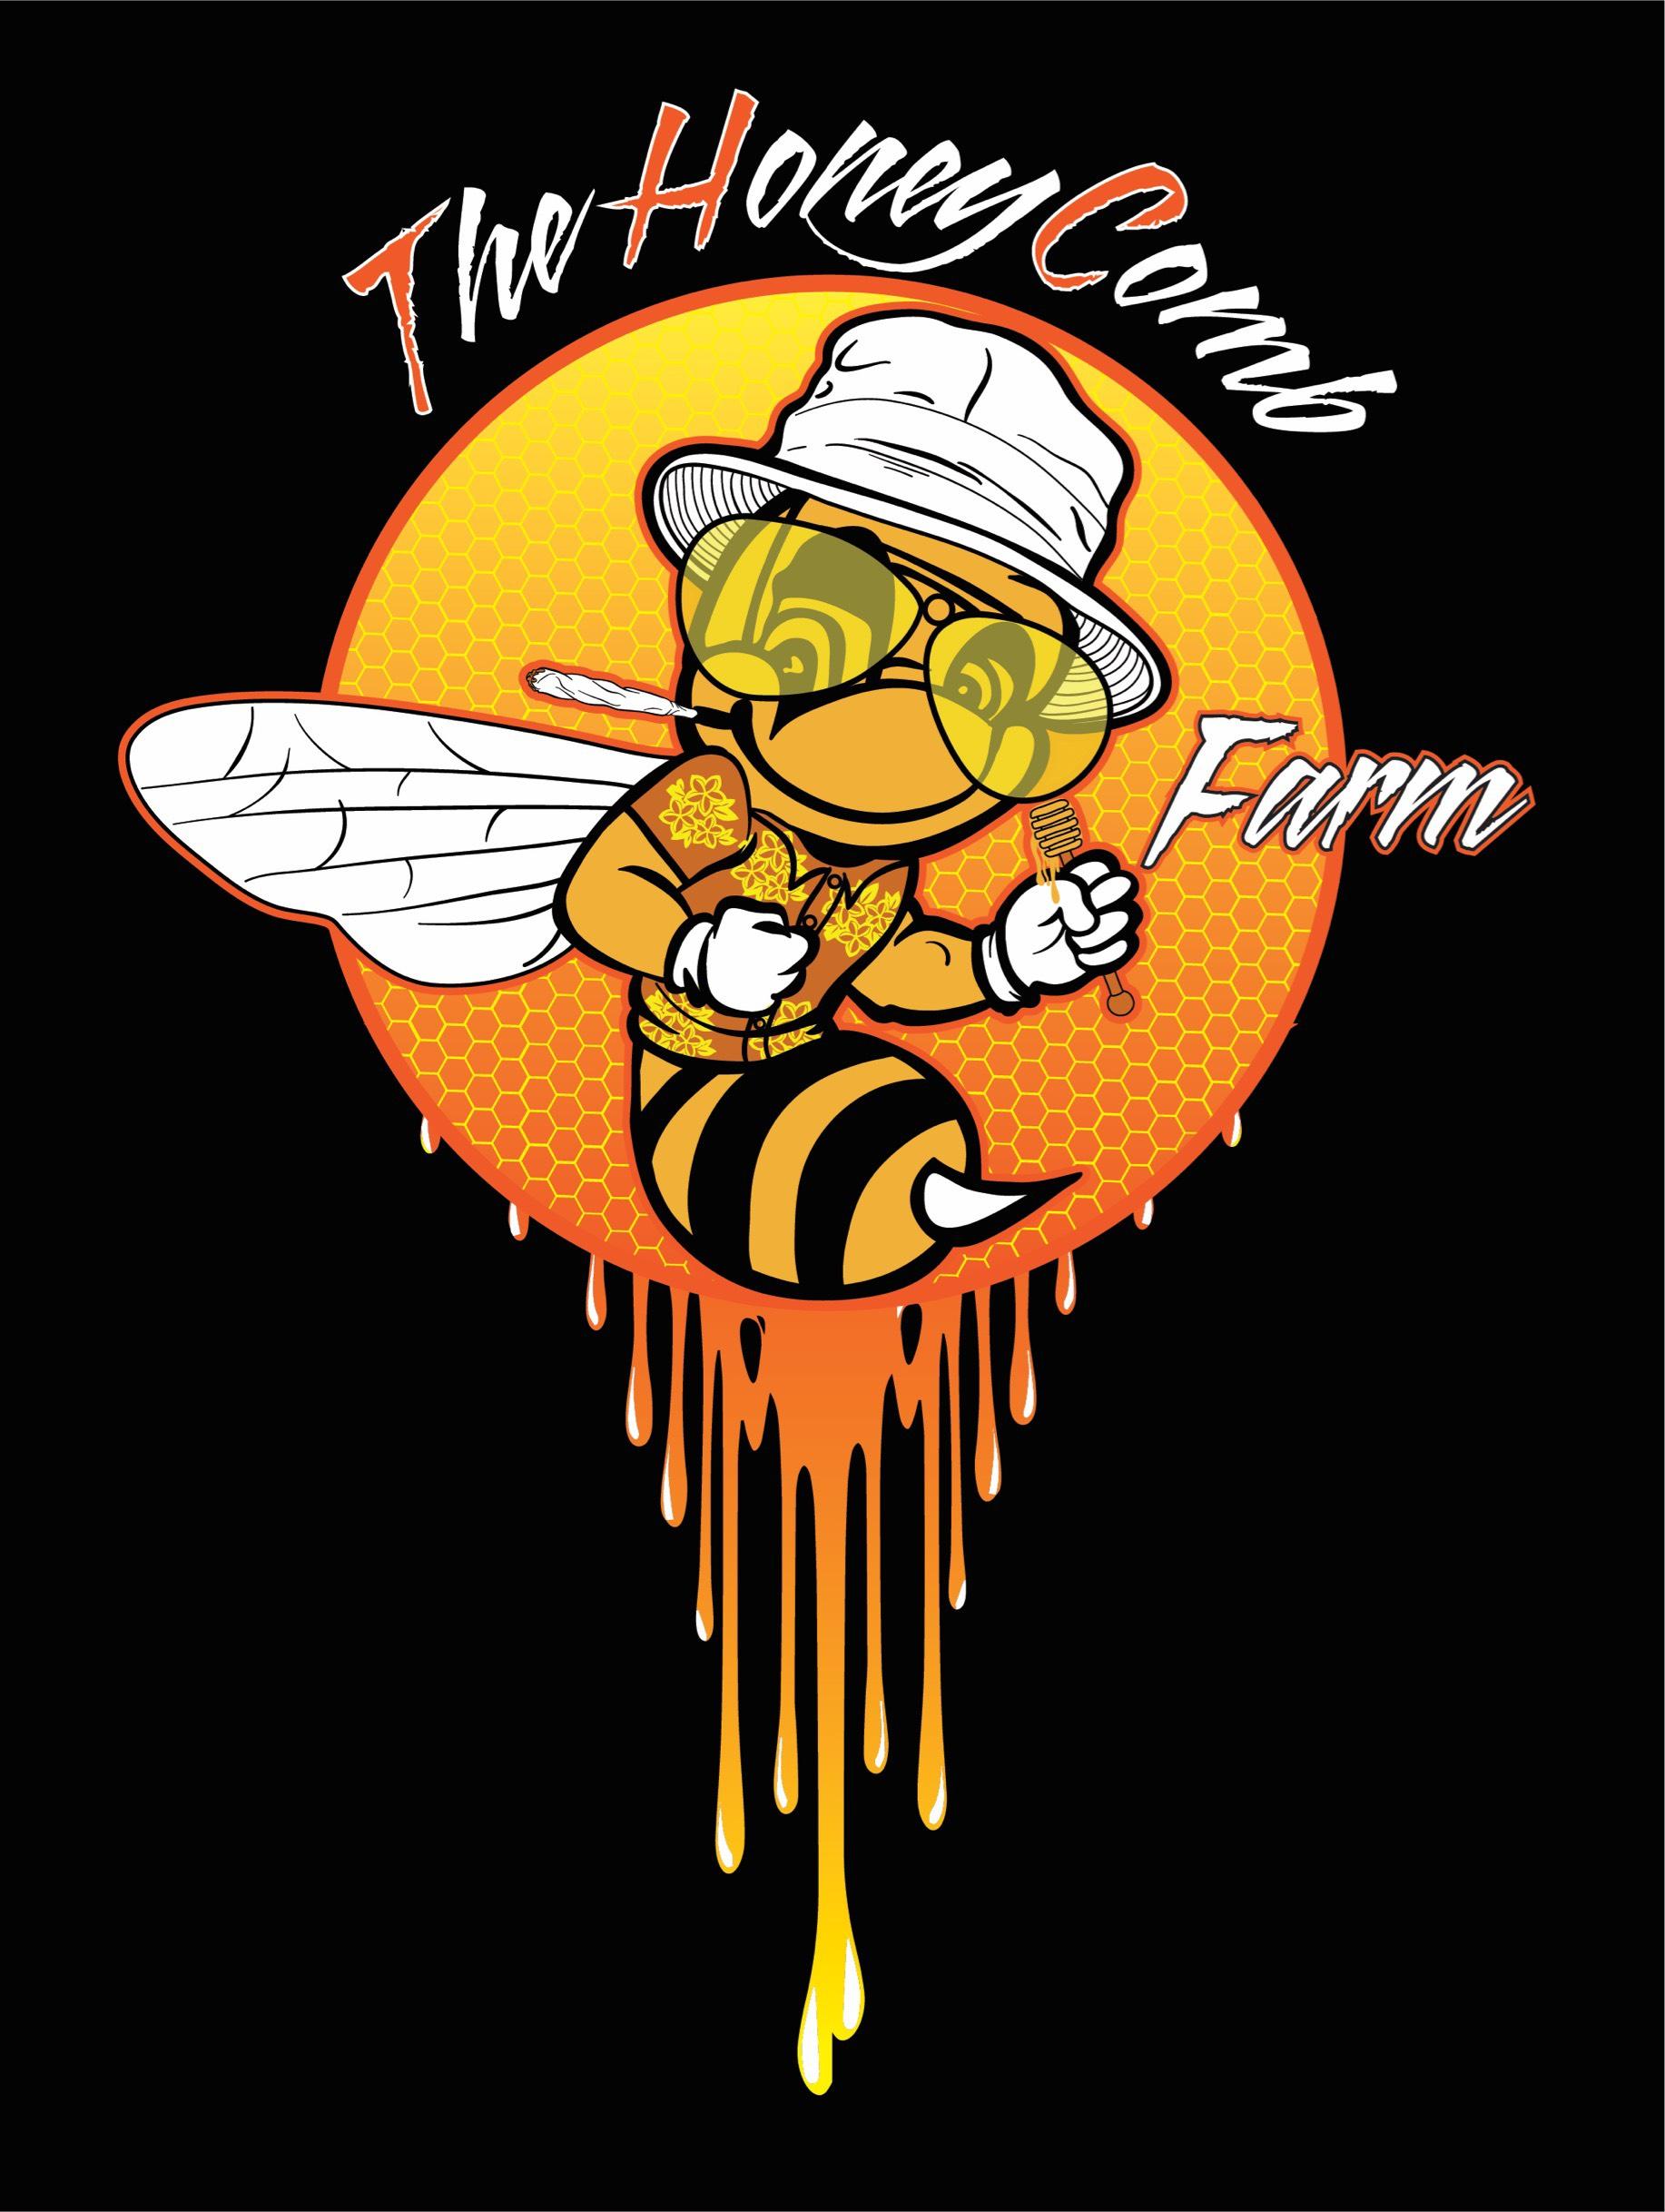 hone comb farm logo.jpg